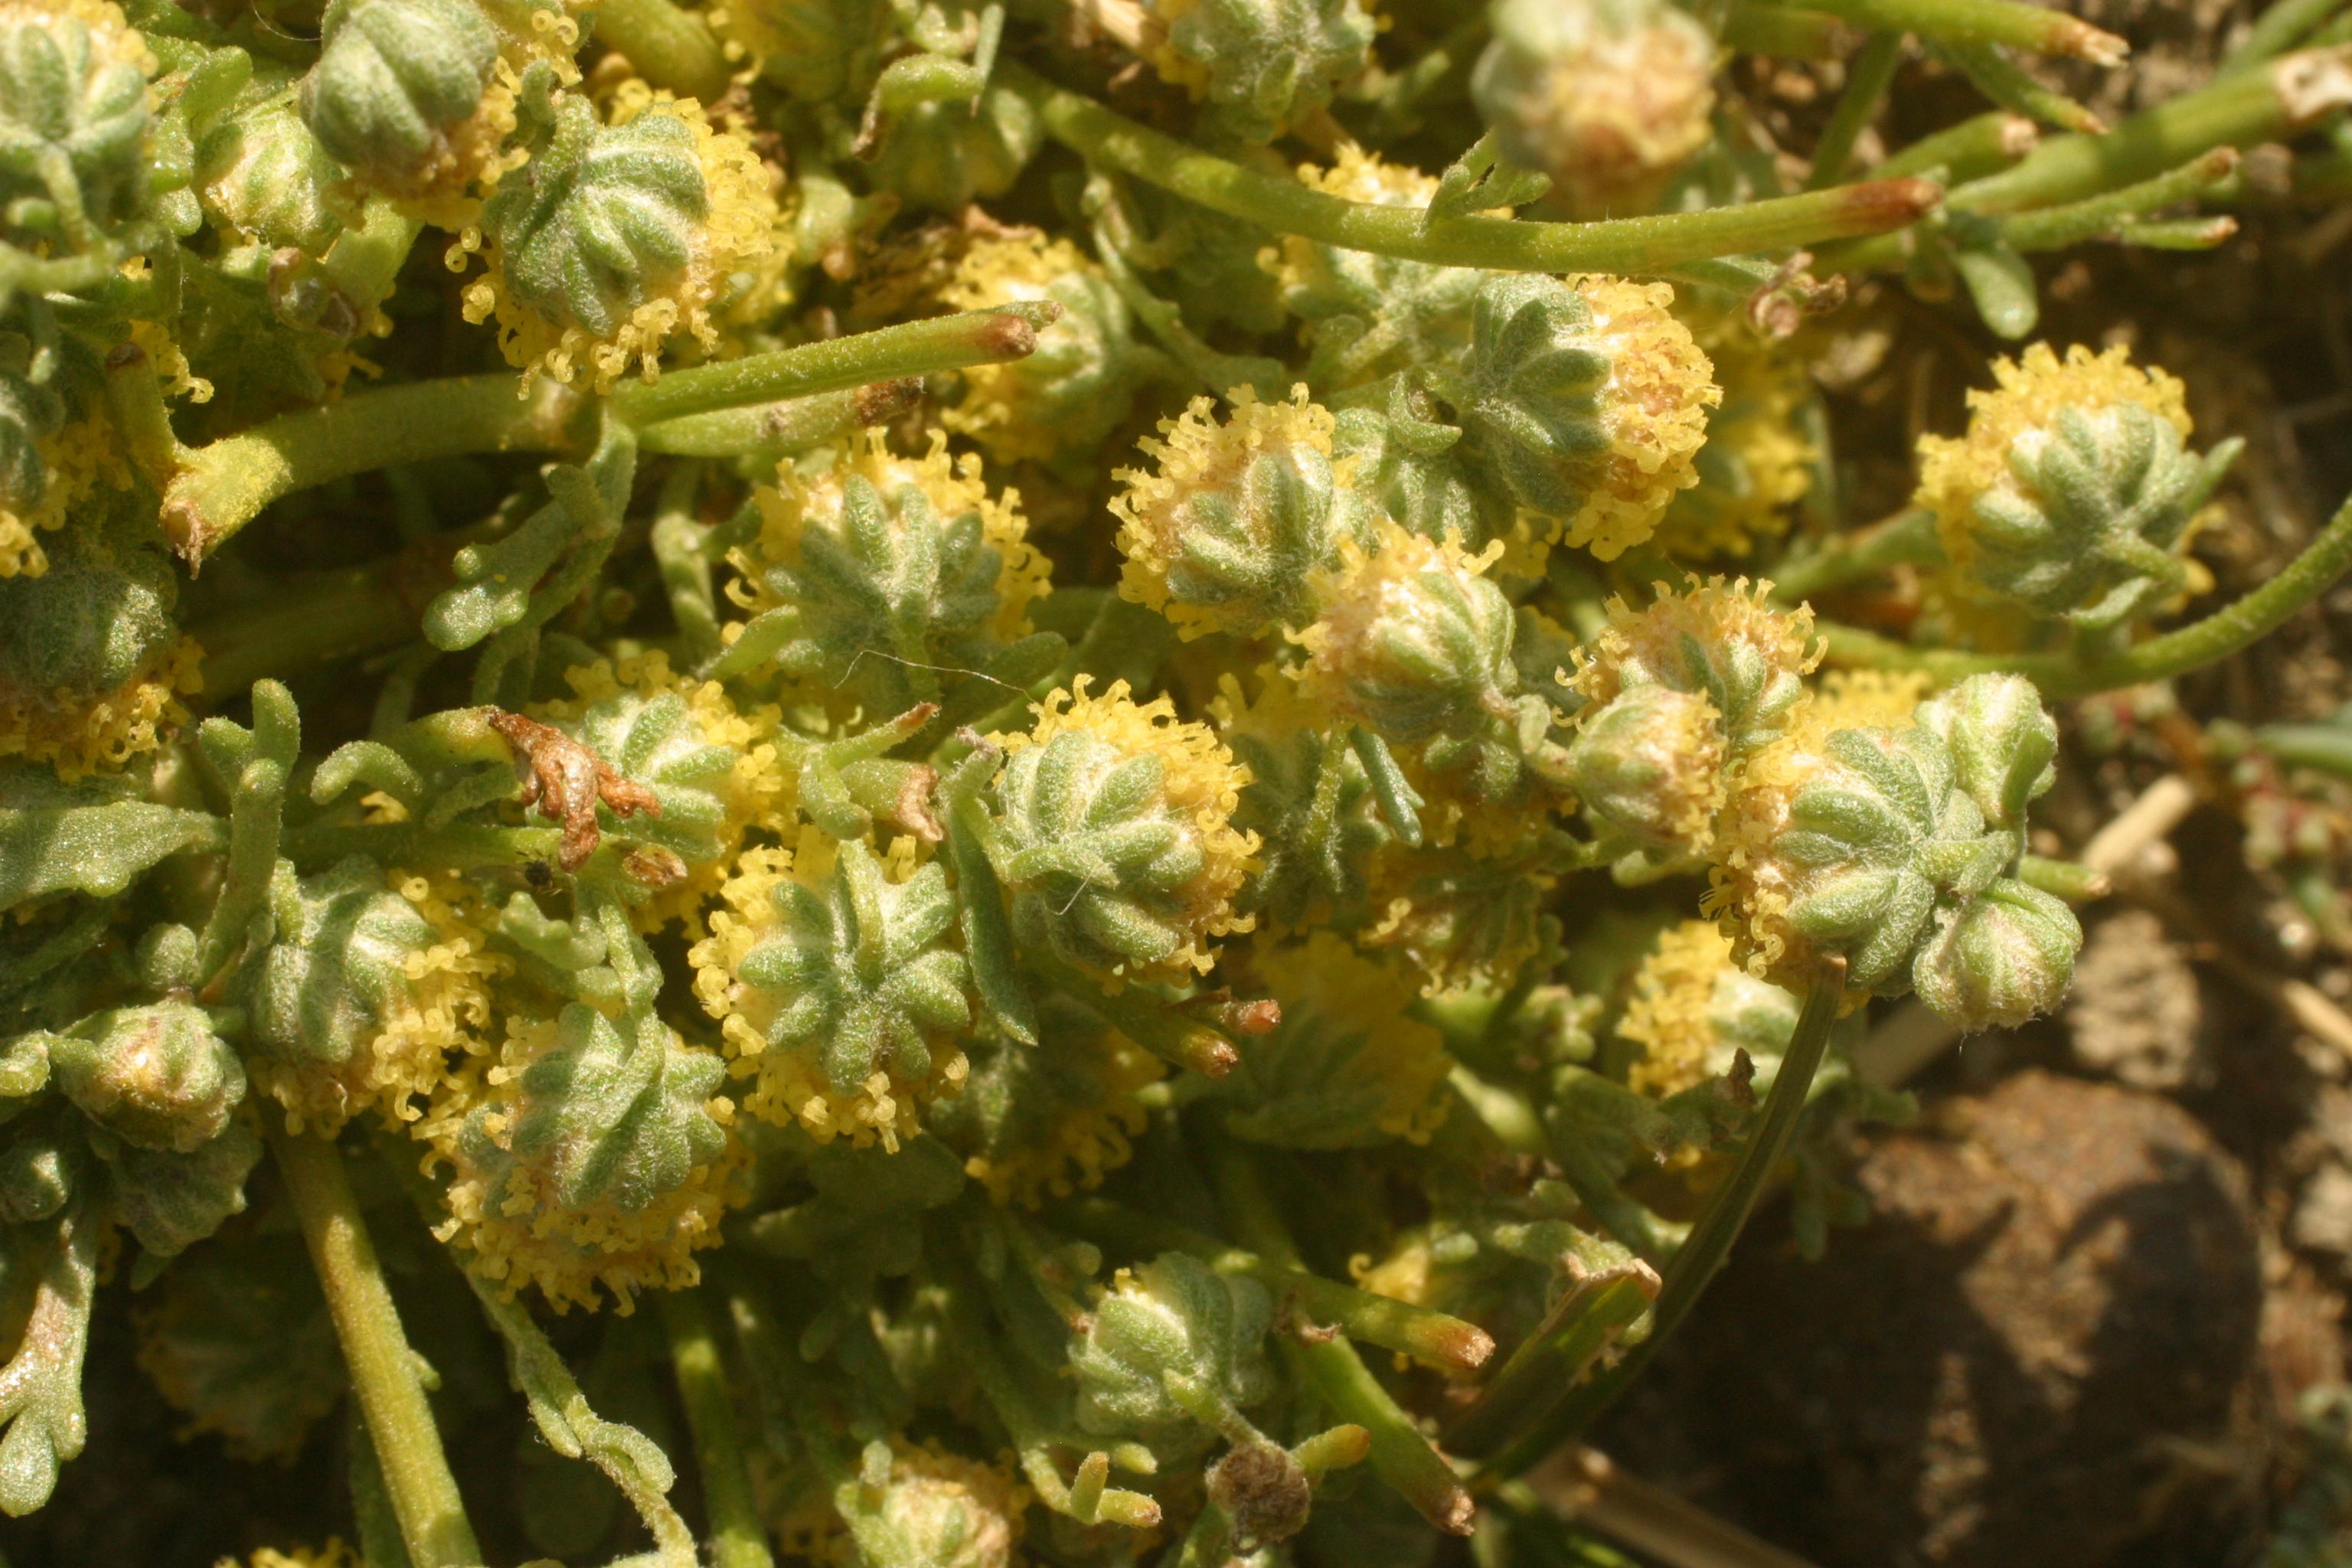 view image: Stilpnolepis intricata (Franch.) Shih